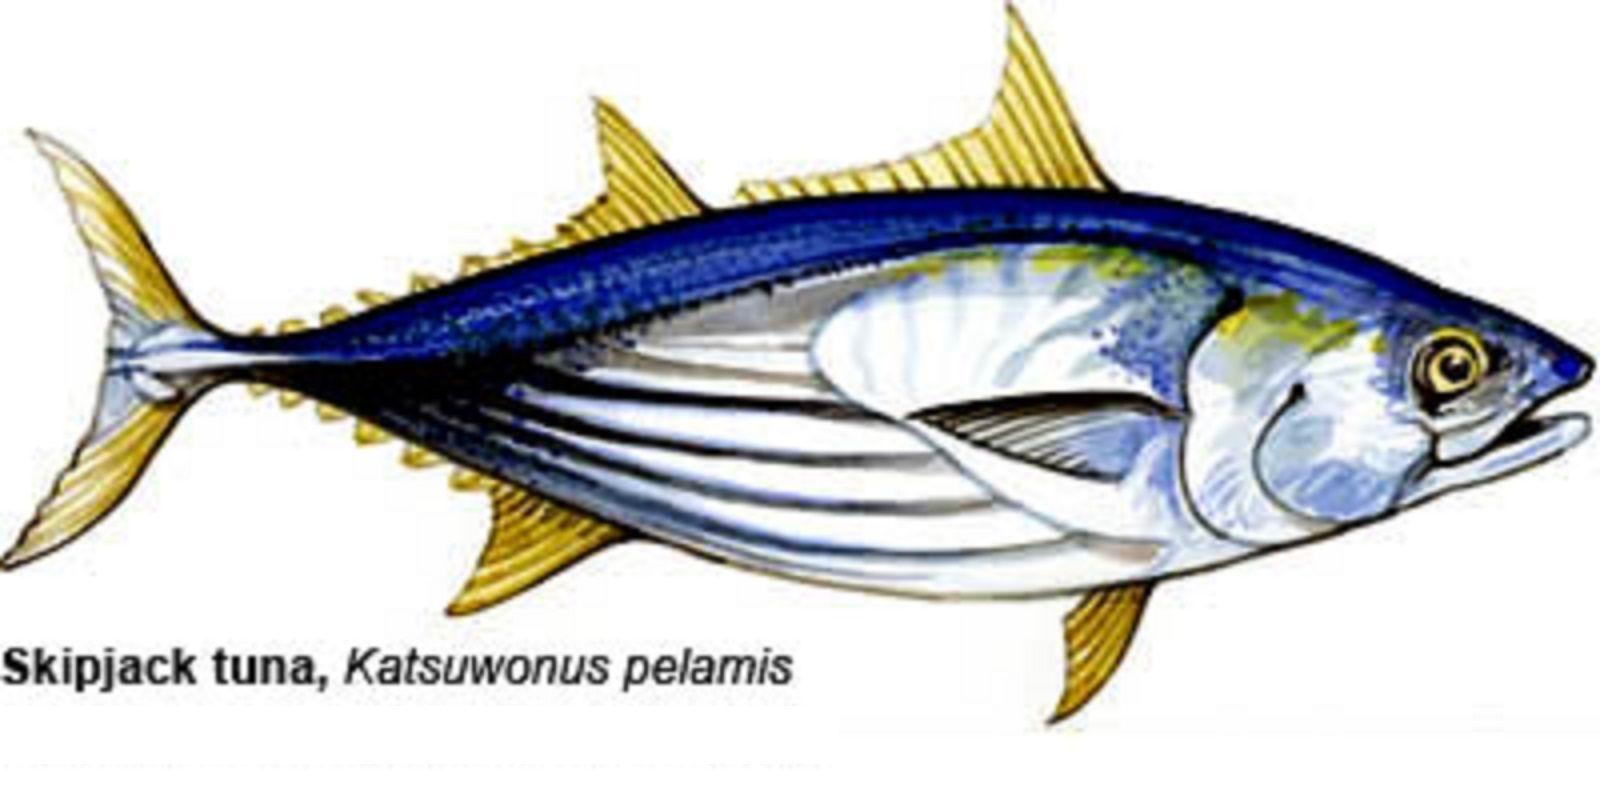 Peixe Bonito de Barriga Listrada (Katsuwonus pelamis)